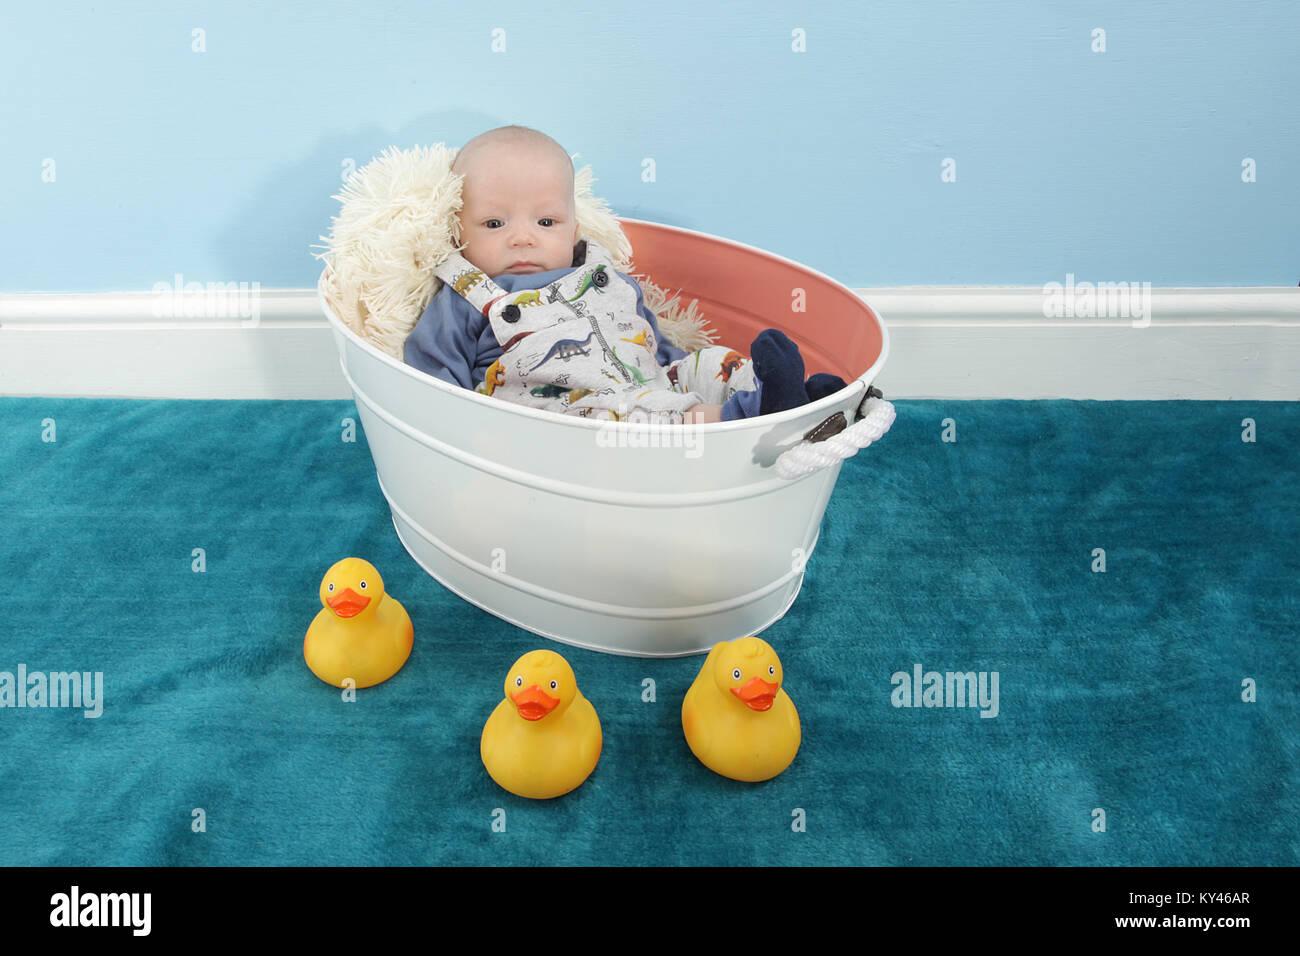 Tin Bath Tub Stock Photos & Tin Bath Tub Stock Images - Alamy